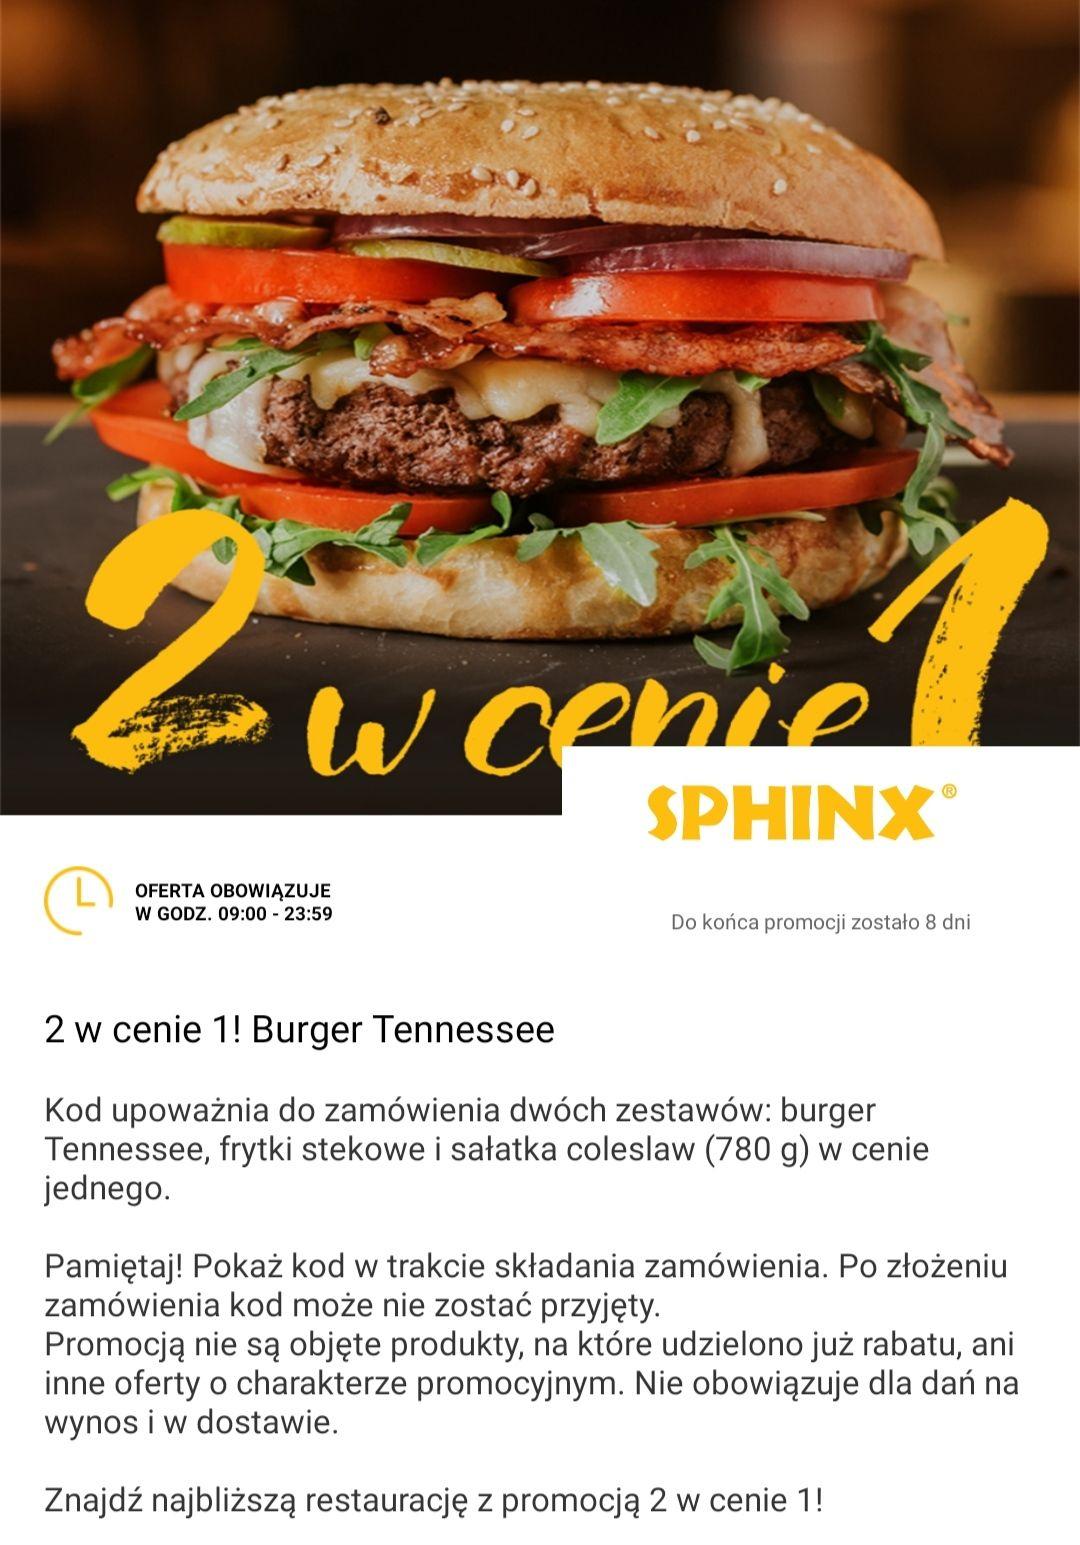 Burger Tennessee w Sphinx 2 w cenie 1